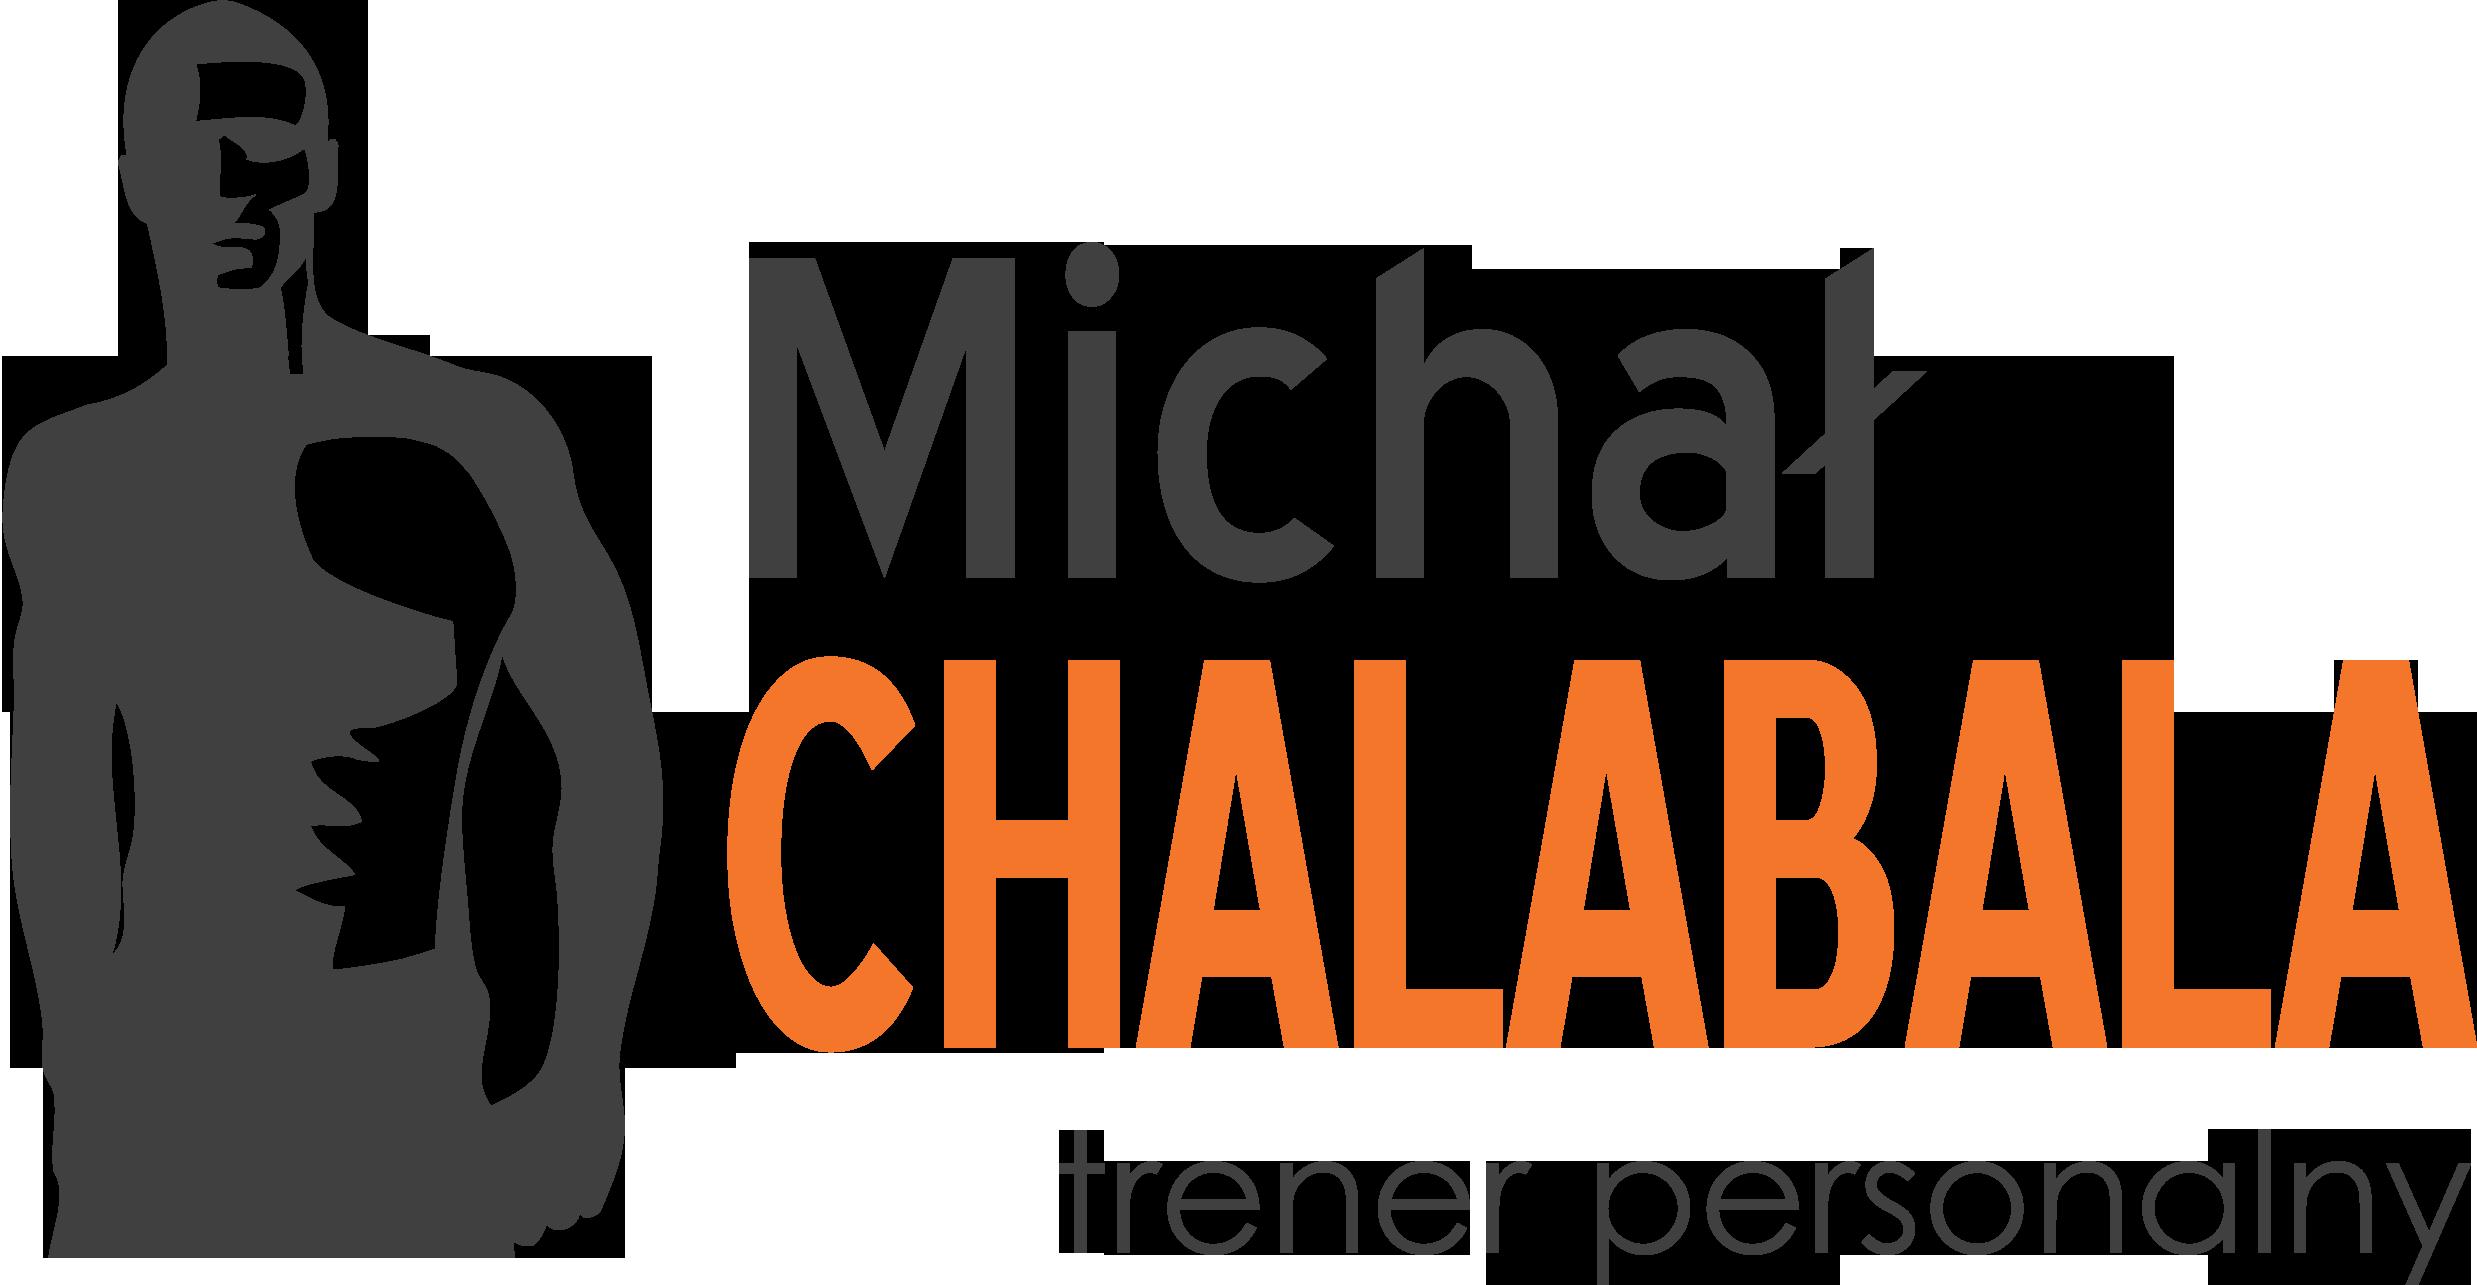 Chalabala